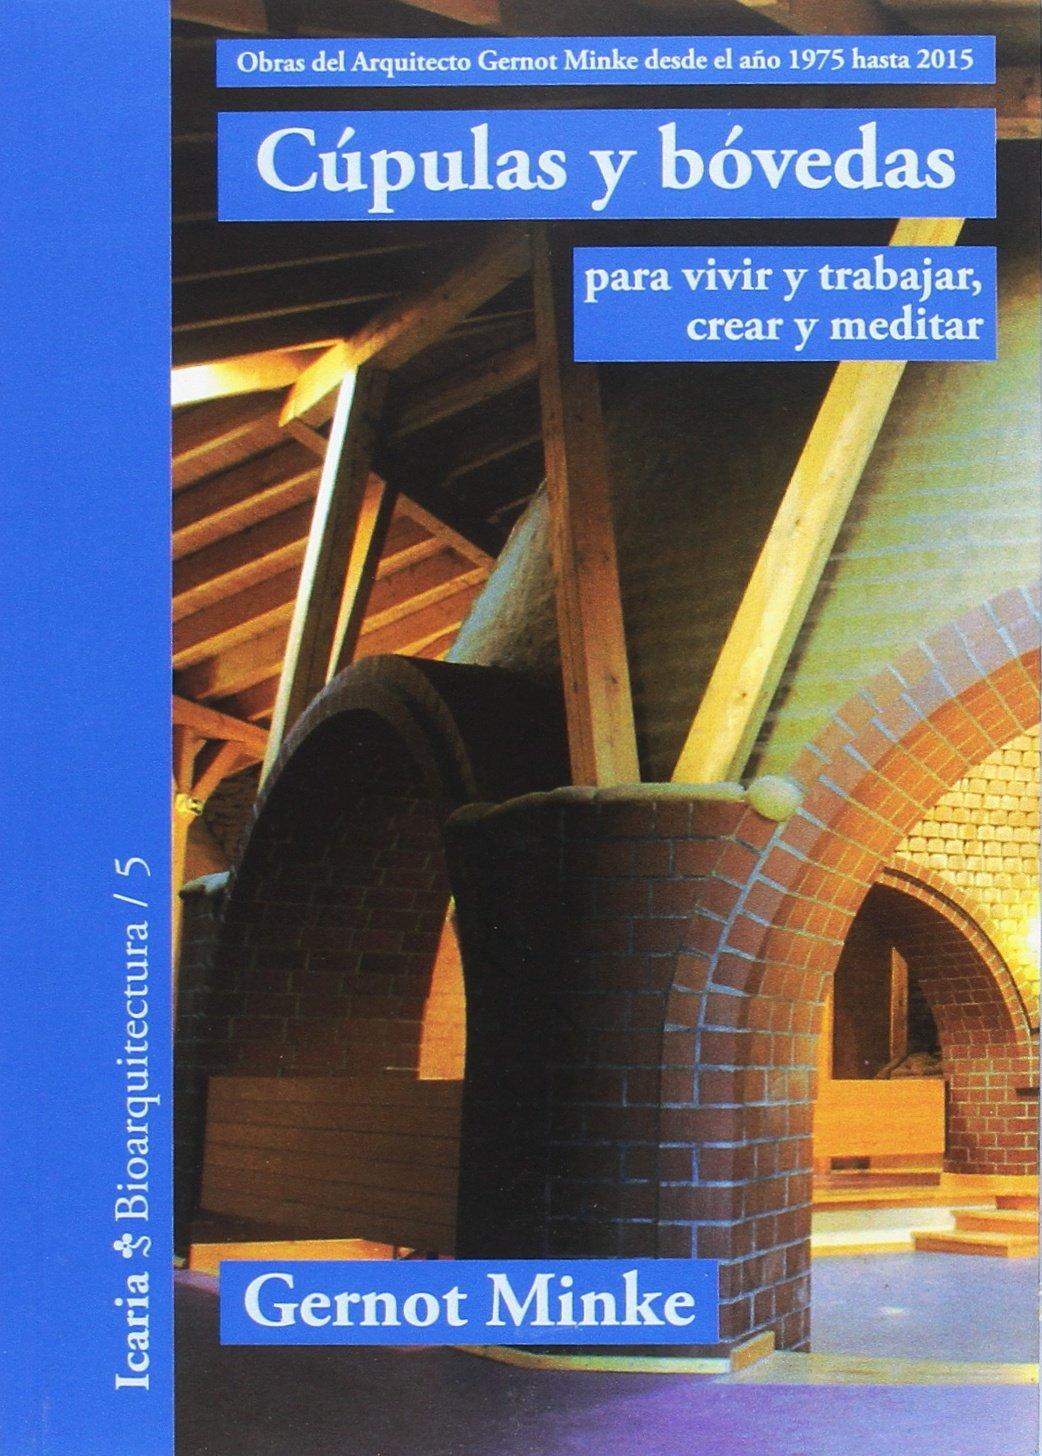 CUPULAS Y BOVEDAS (Bioarquitectura) Tapa blanda – 15 may 2017 GERNOT MINKE Icaria editorial 8498887747 AMCR